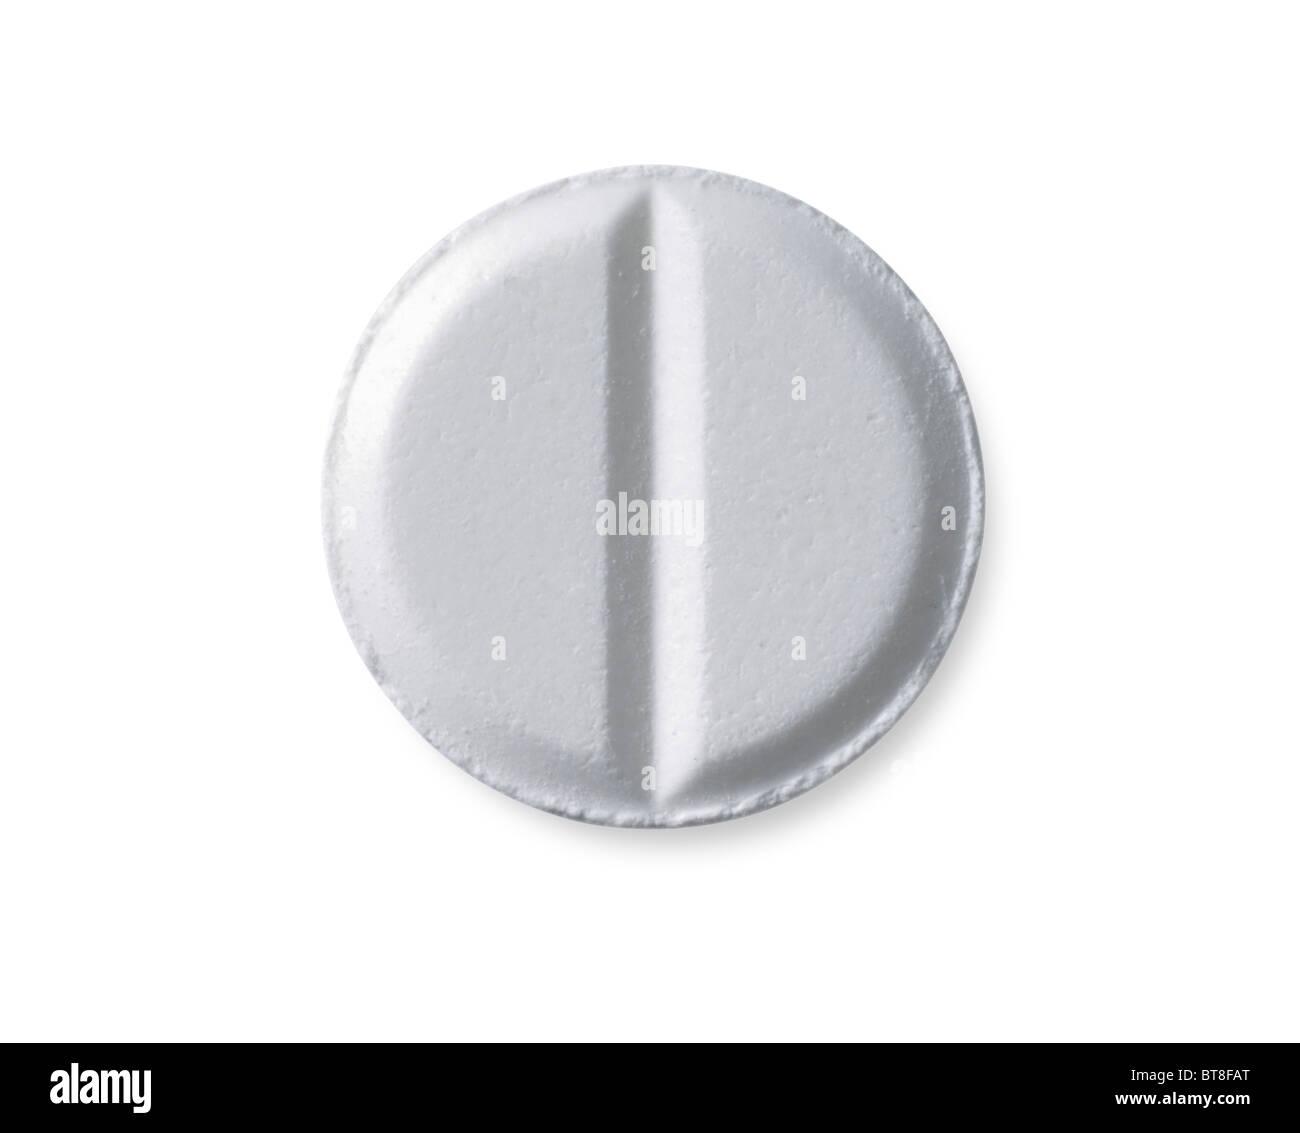 White circular medicinal pill. - Stock Image